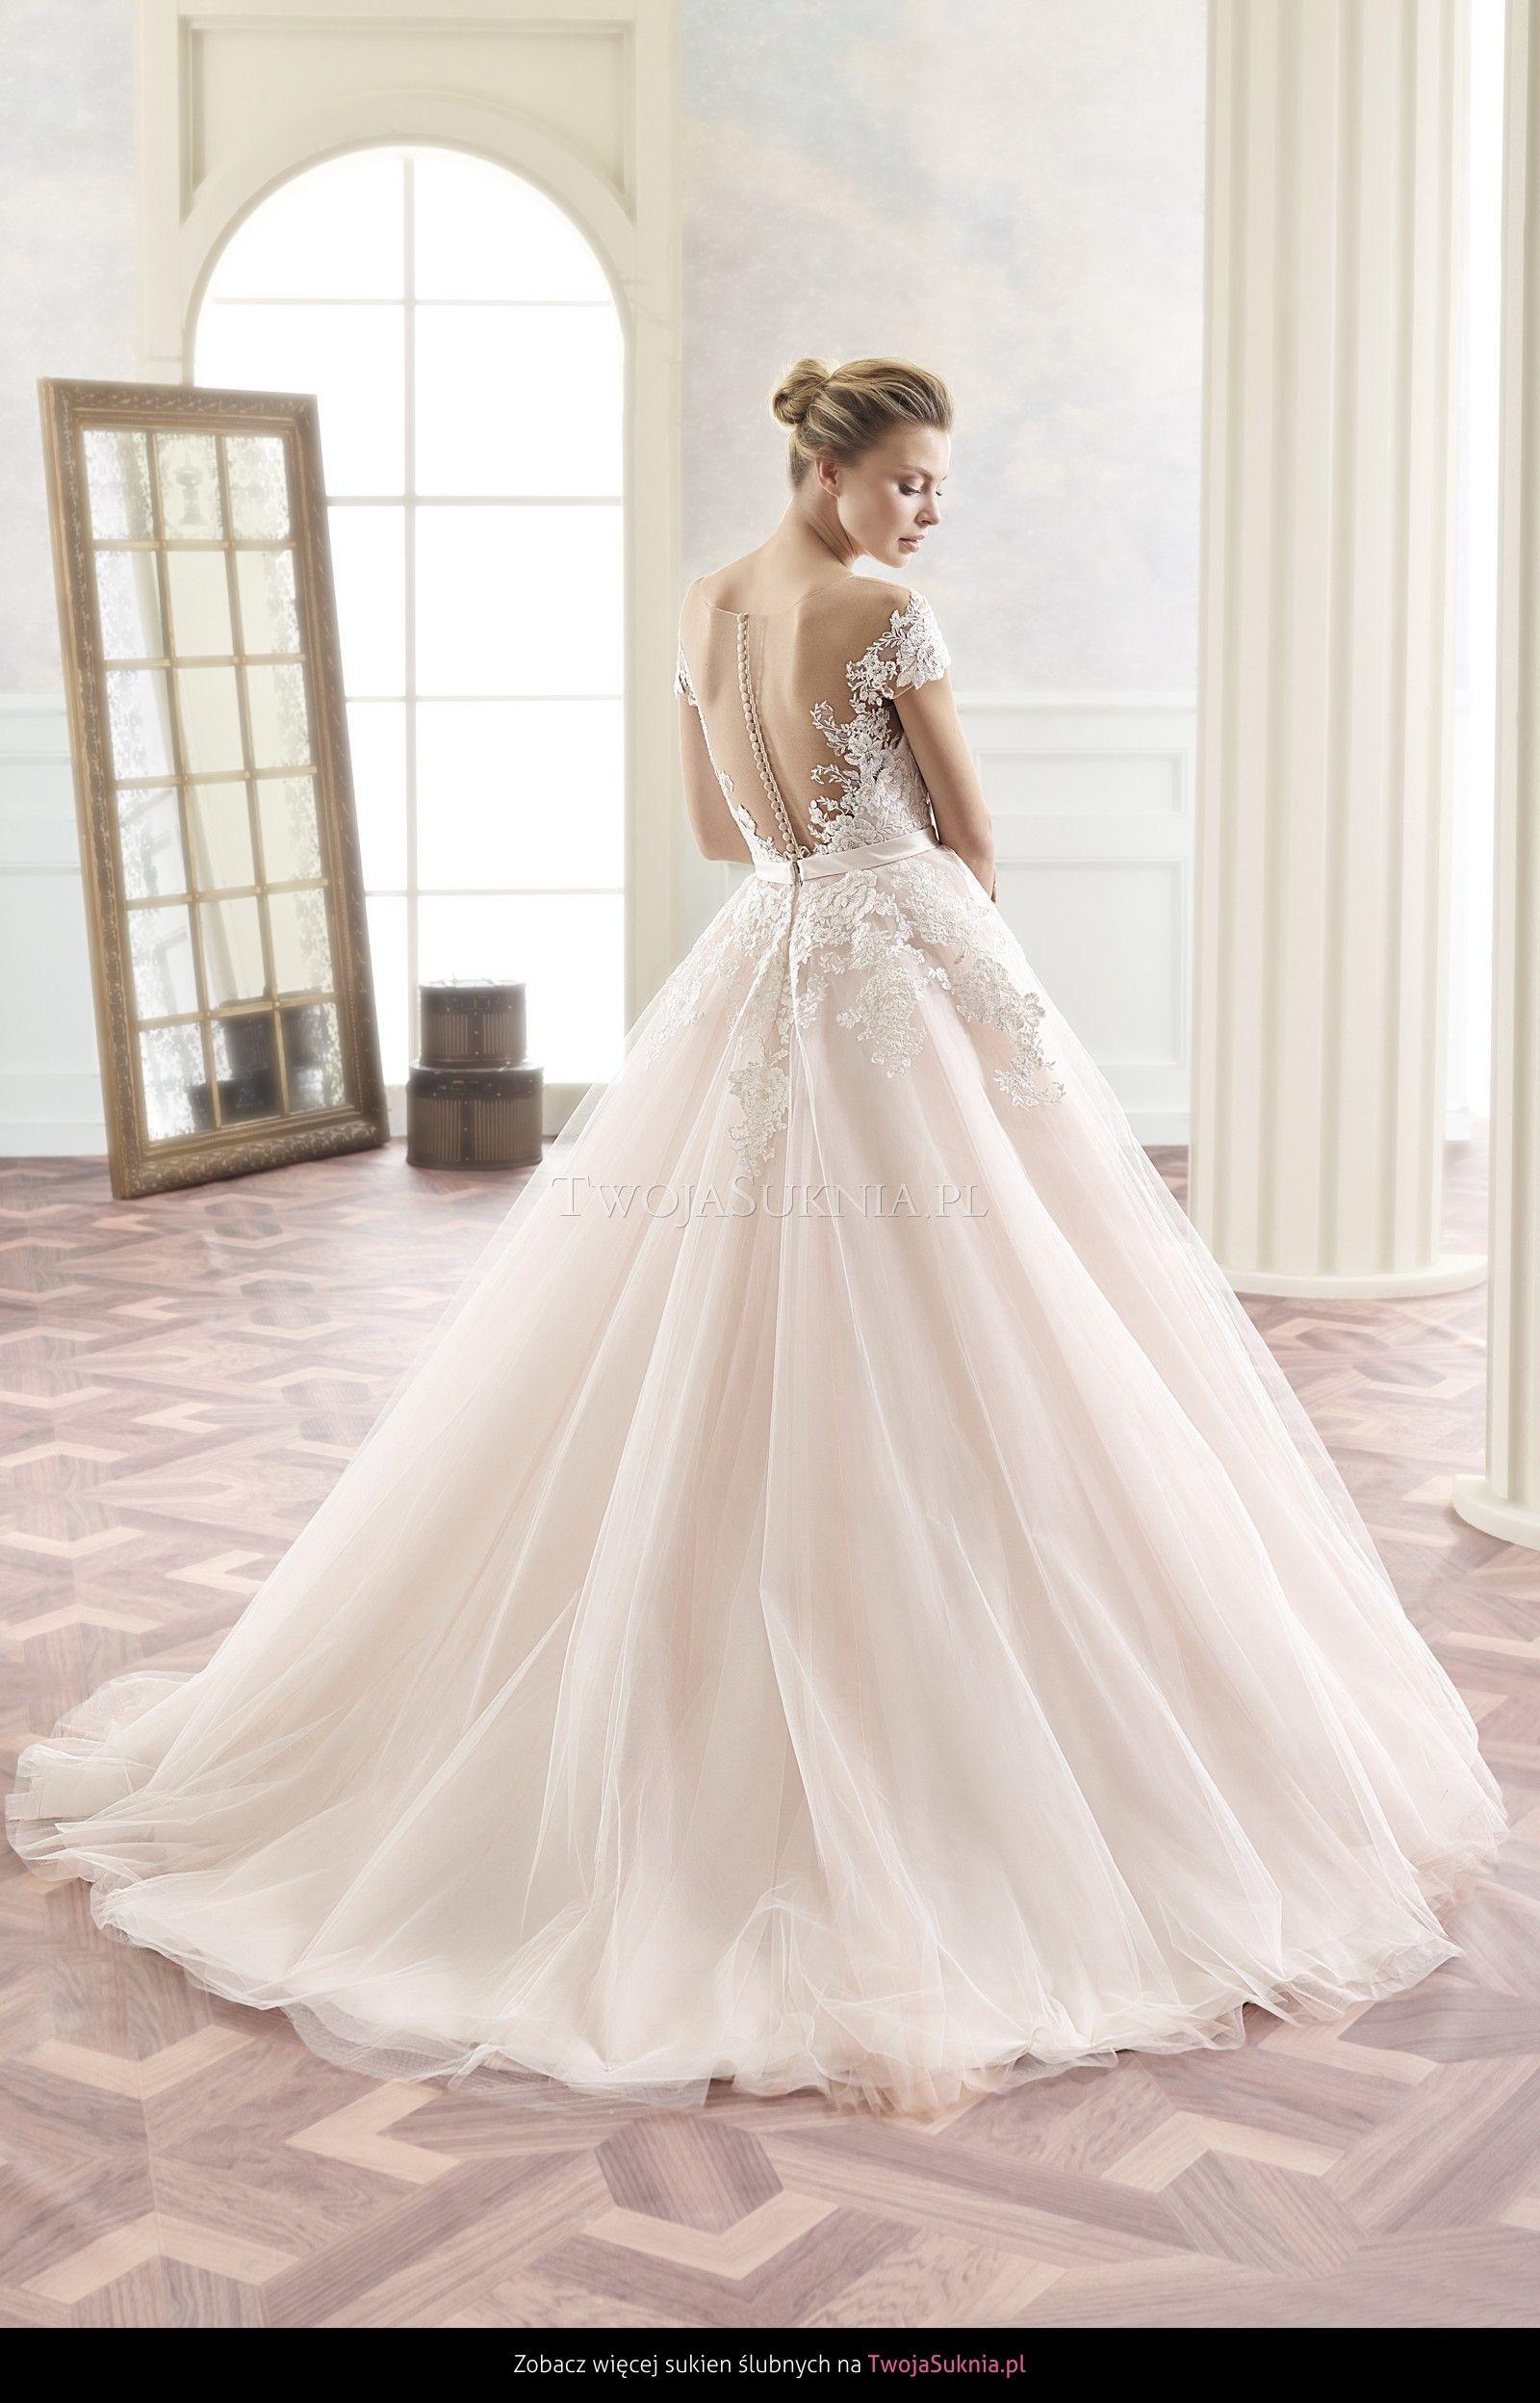 Modeca - Twinkle - 13  Wedding dresses, White bridal dresses